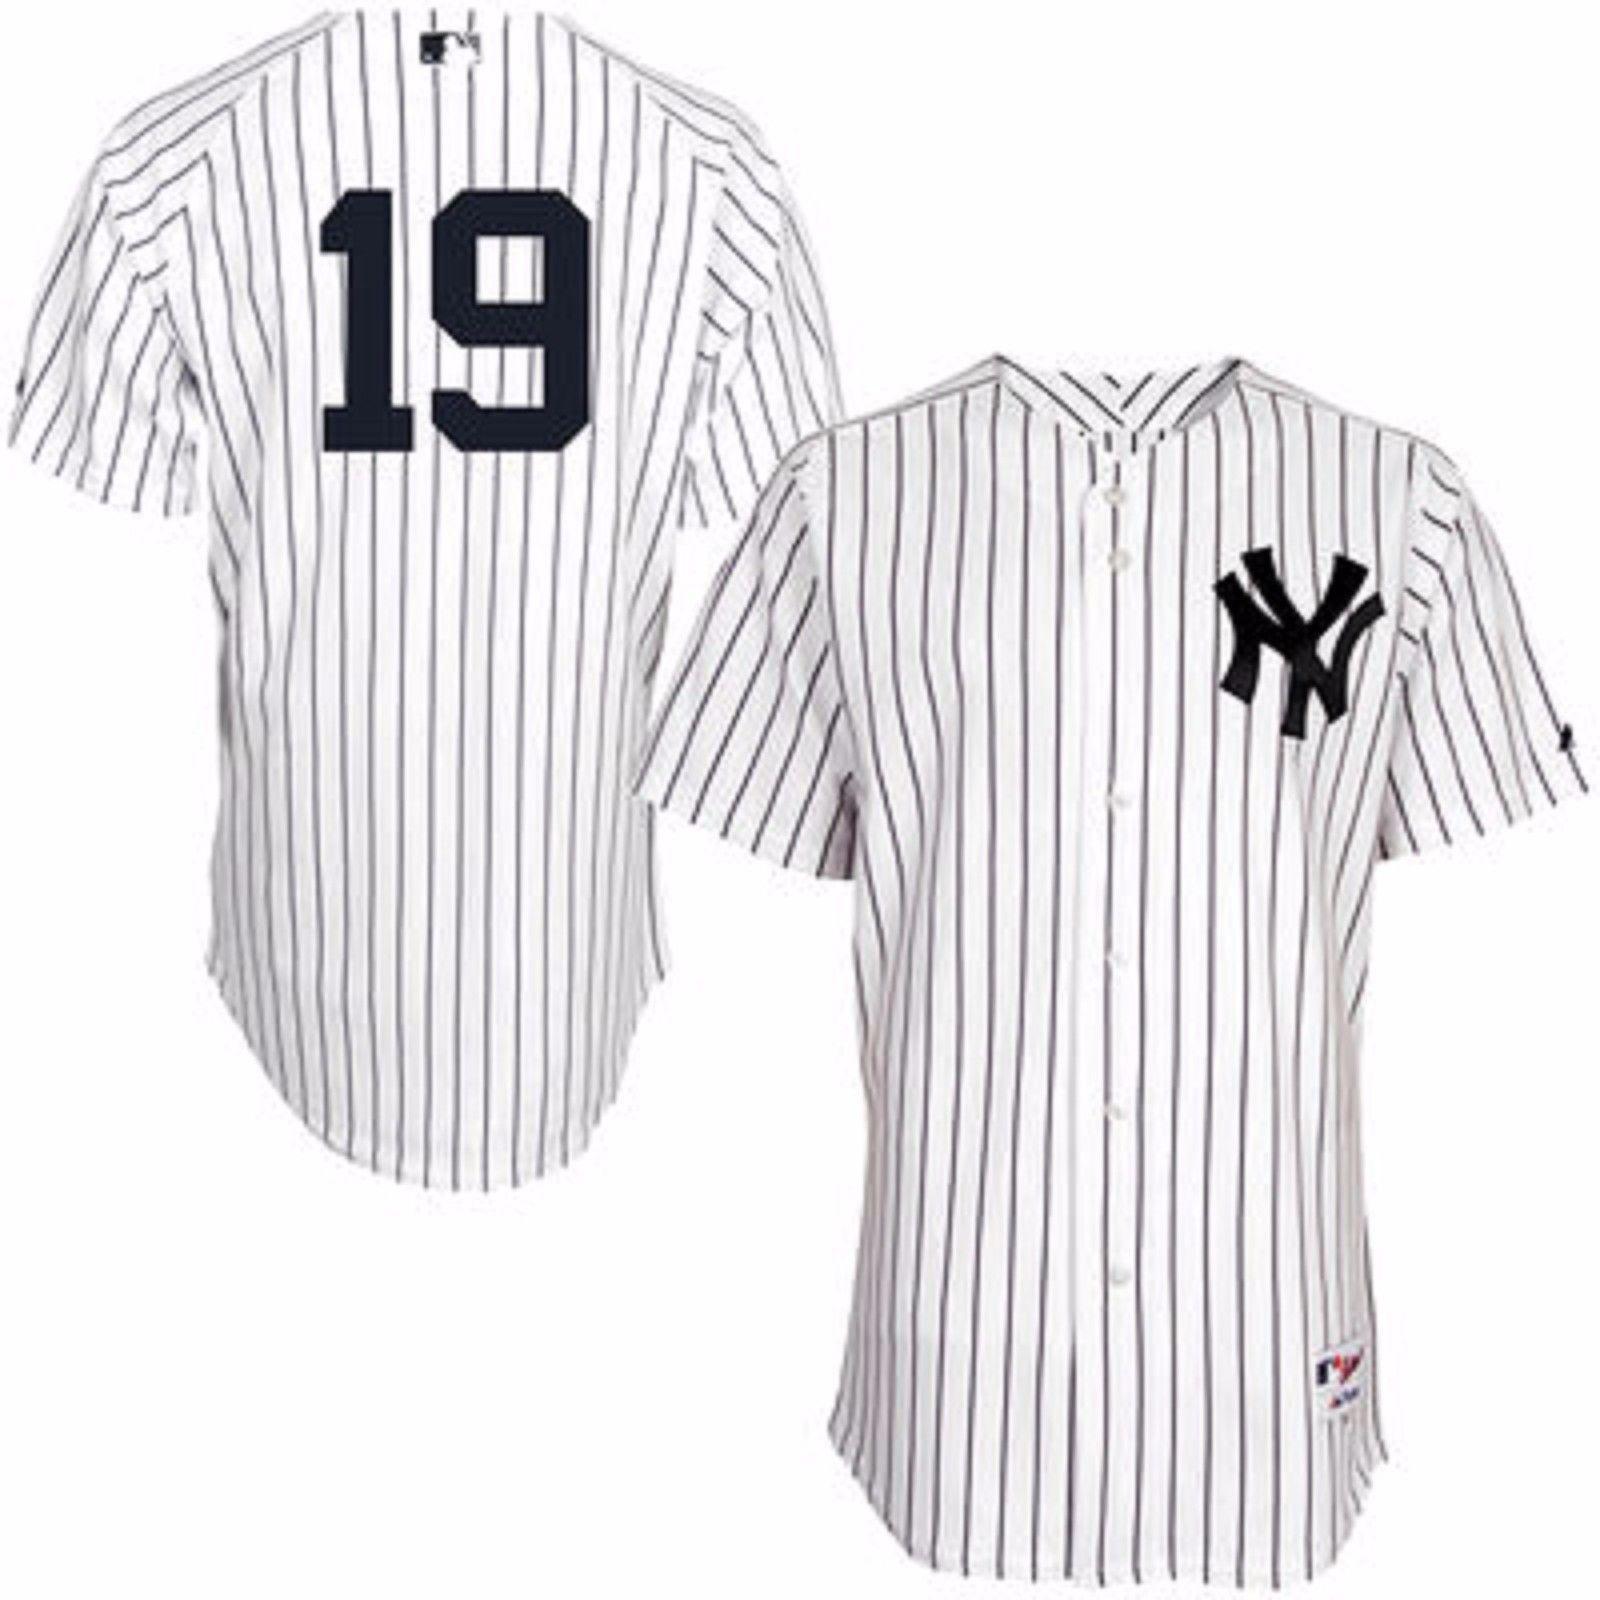 05eae82e369 ... Baseball-MLB 24410 New York Yankees Masahiro Tanaka 19 Majestic Adult  Jersey- ...